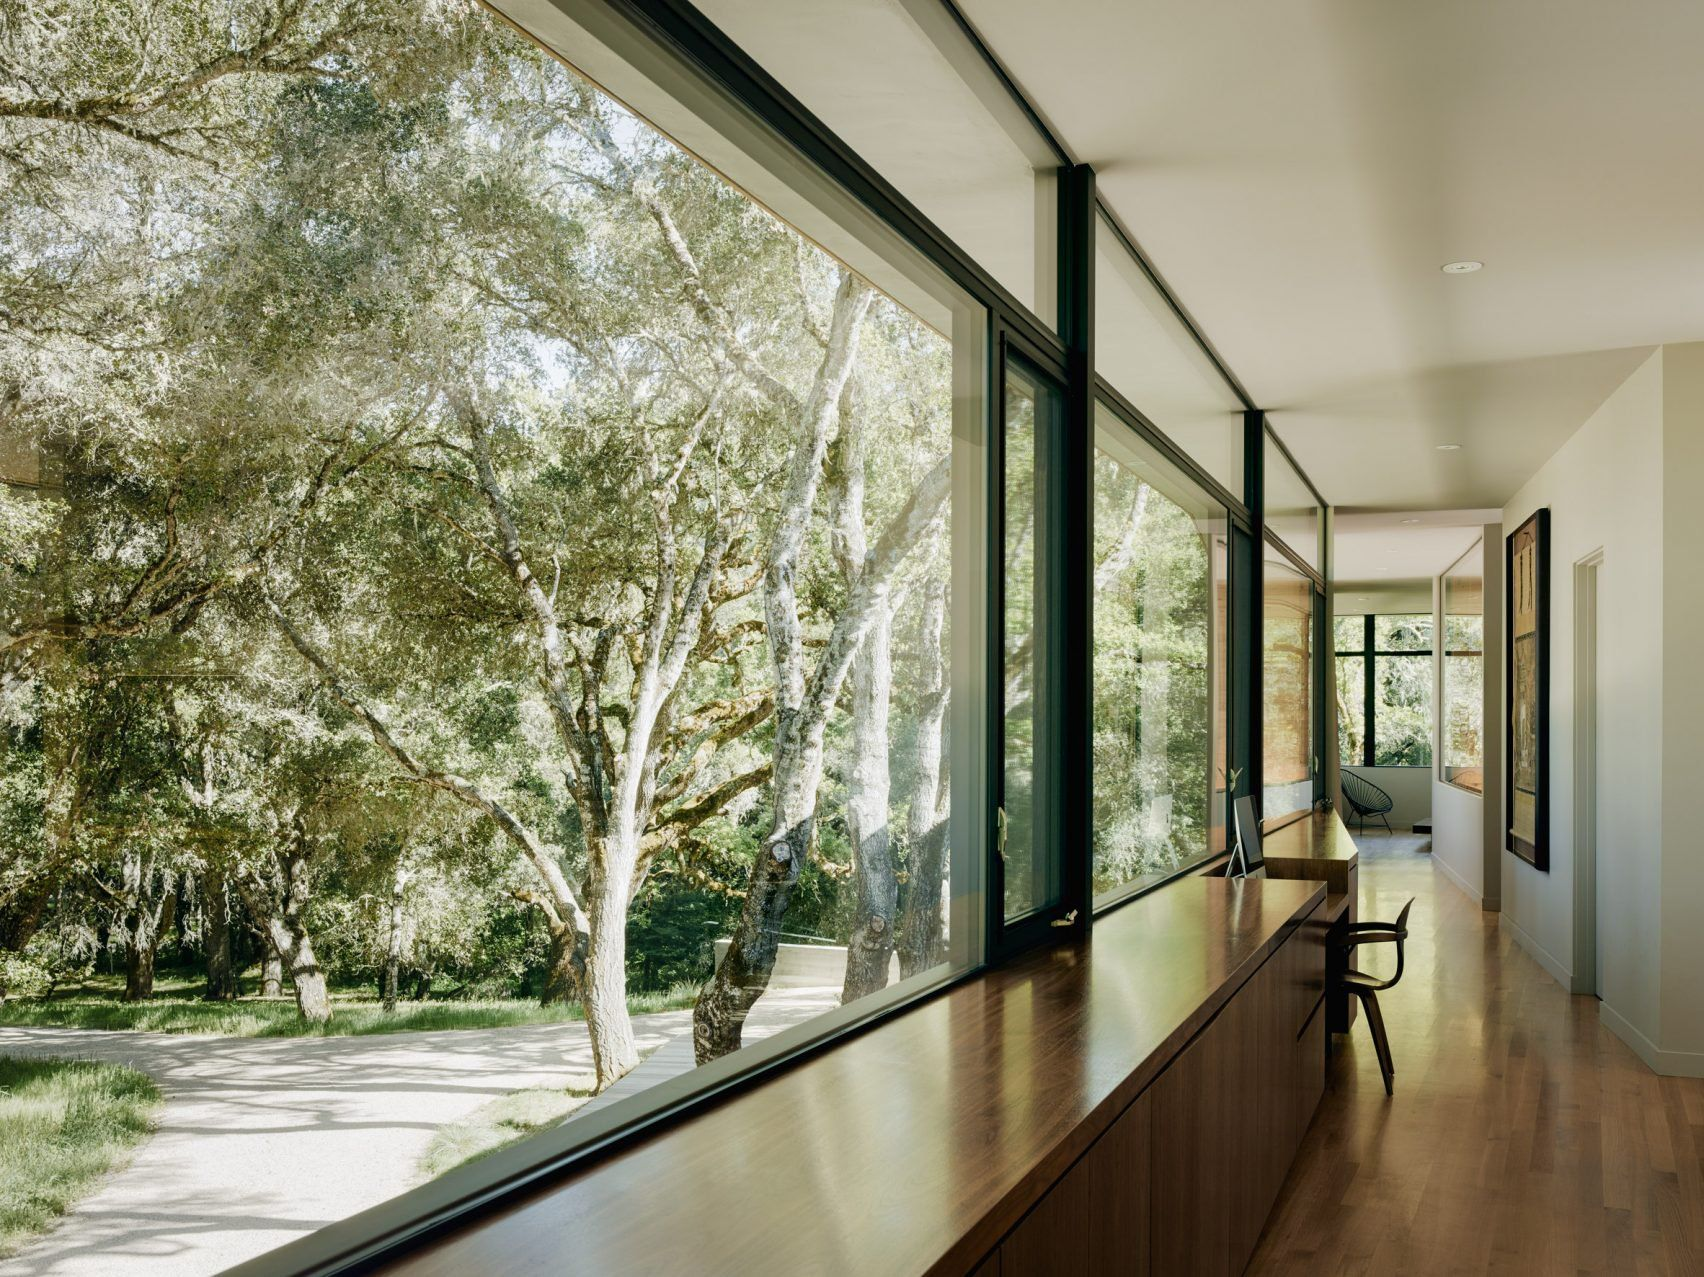 Sagan Piechota creates hillside California home surrounded by oak trees